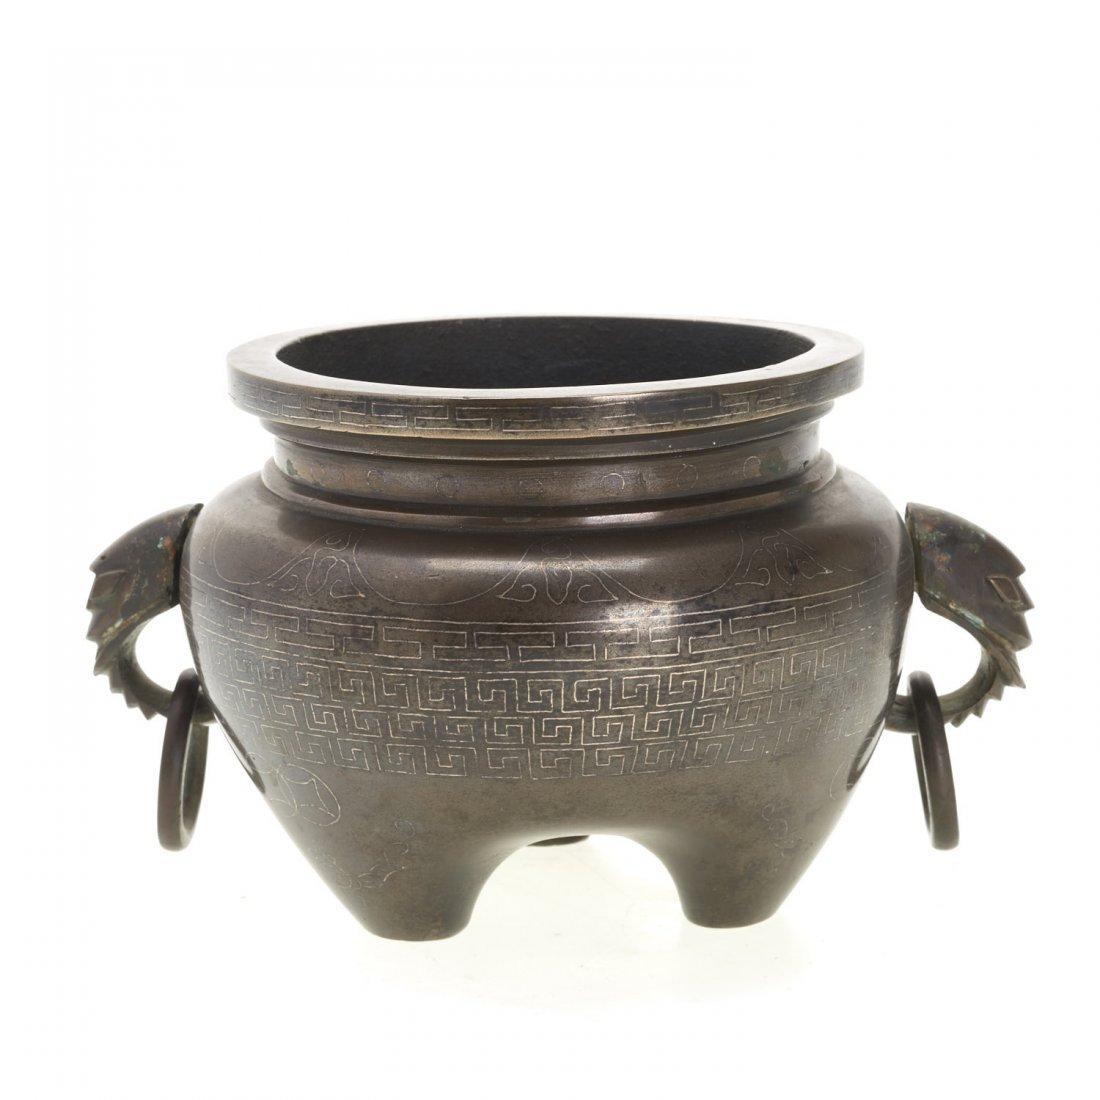 Chinese silver inlaid bronze tripod censer - 3